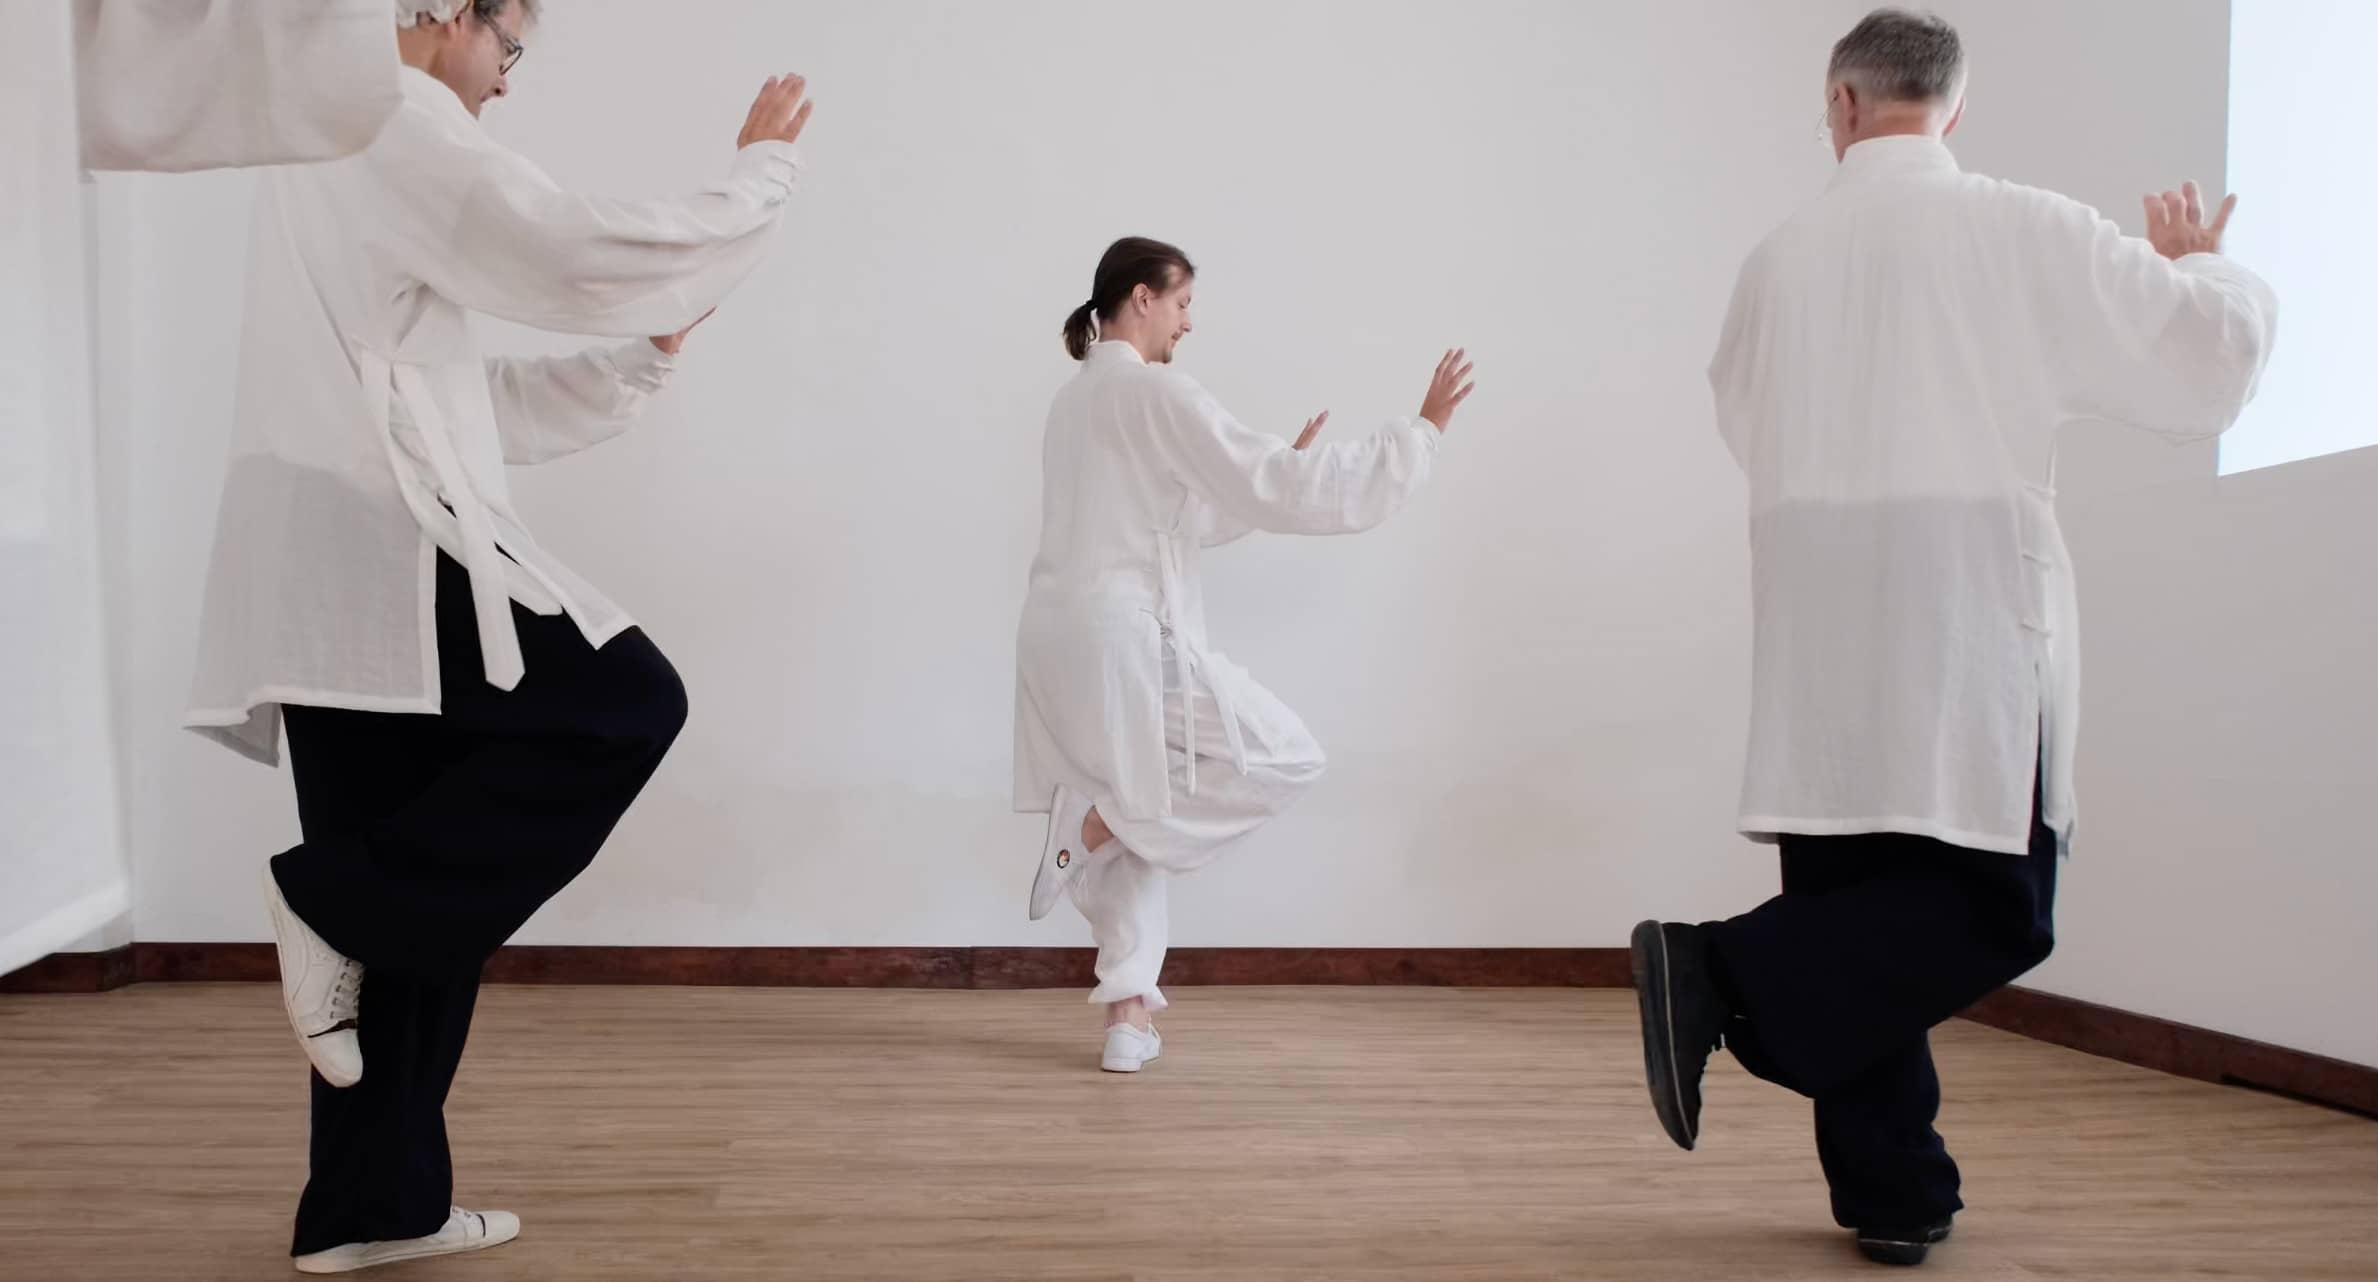 Taiji 13 – Circular Long Step – Part 3